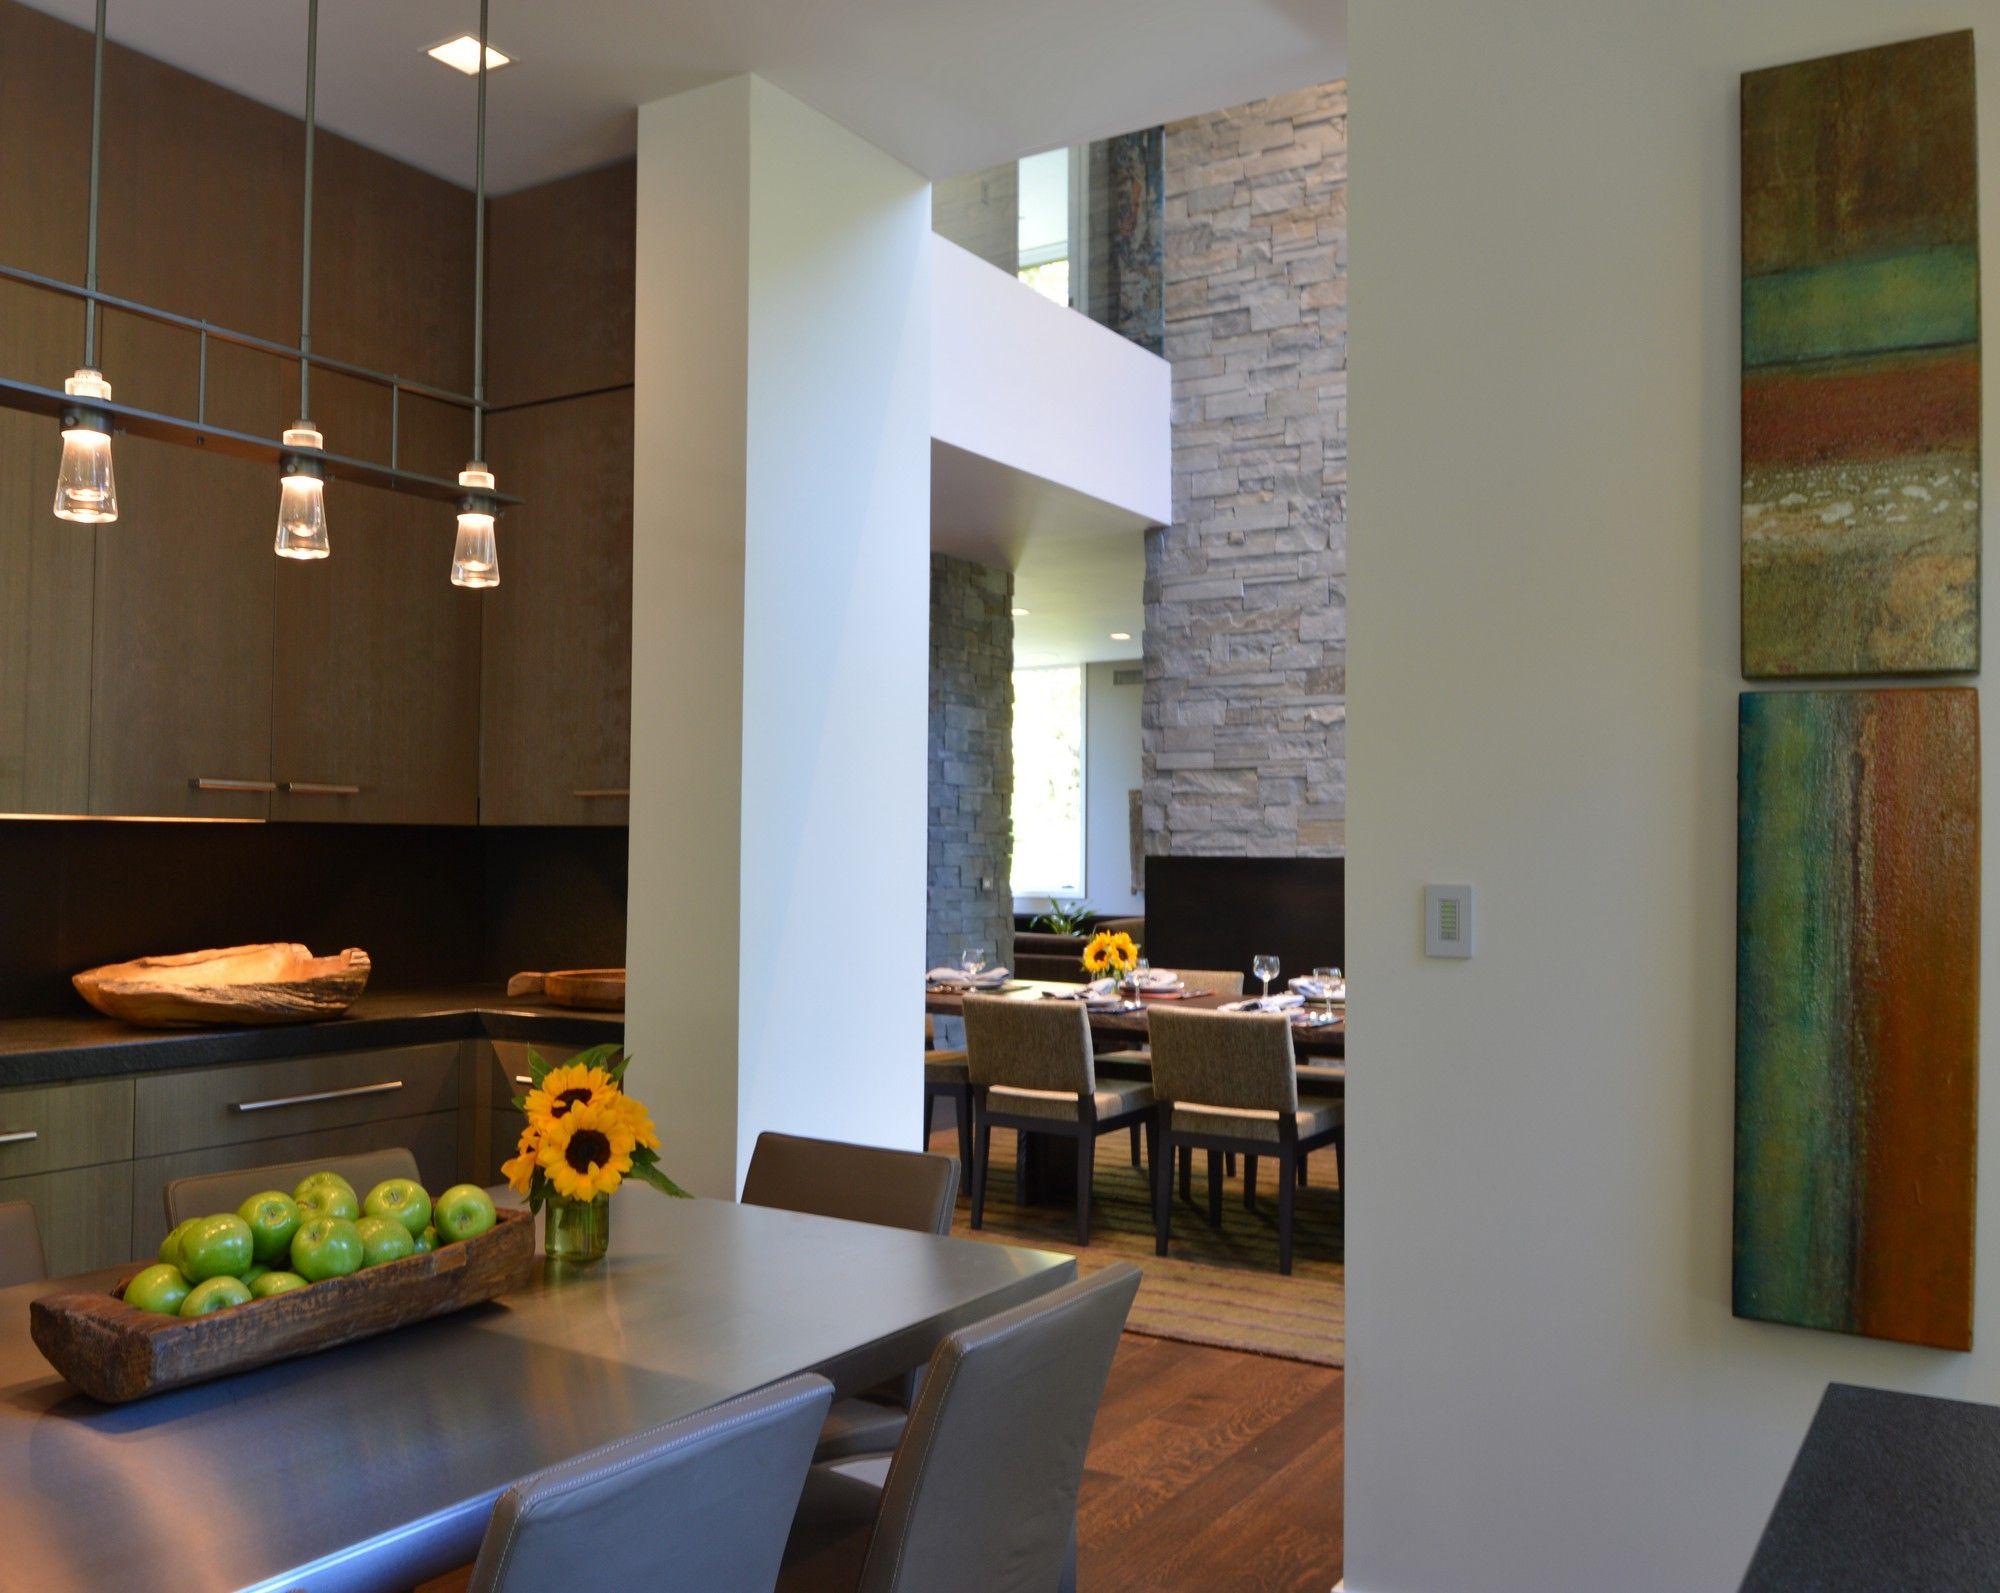 Jordan Rosenberg Architect & ociates - Contemporary Englewood ... on